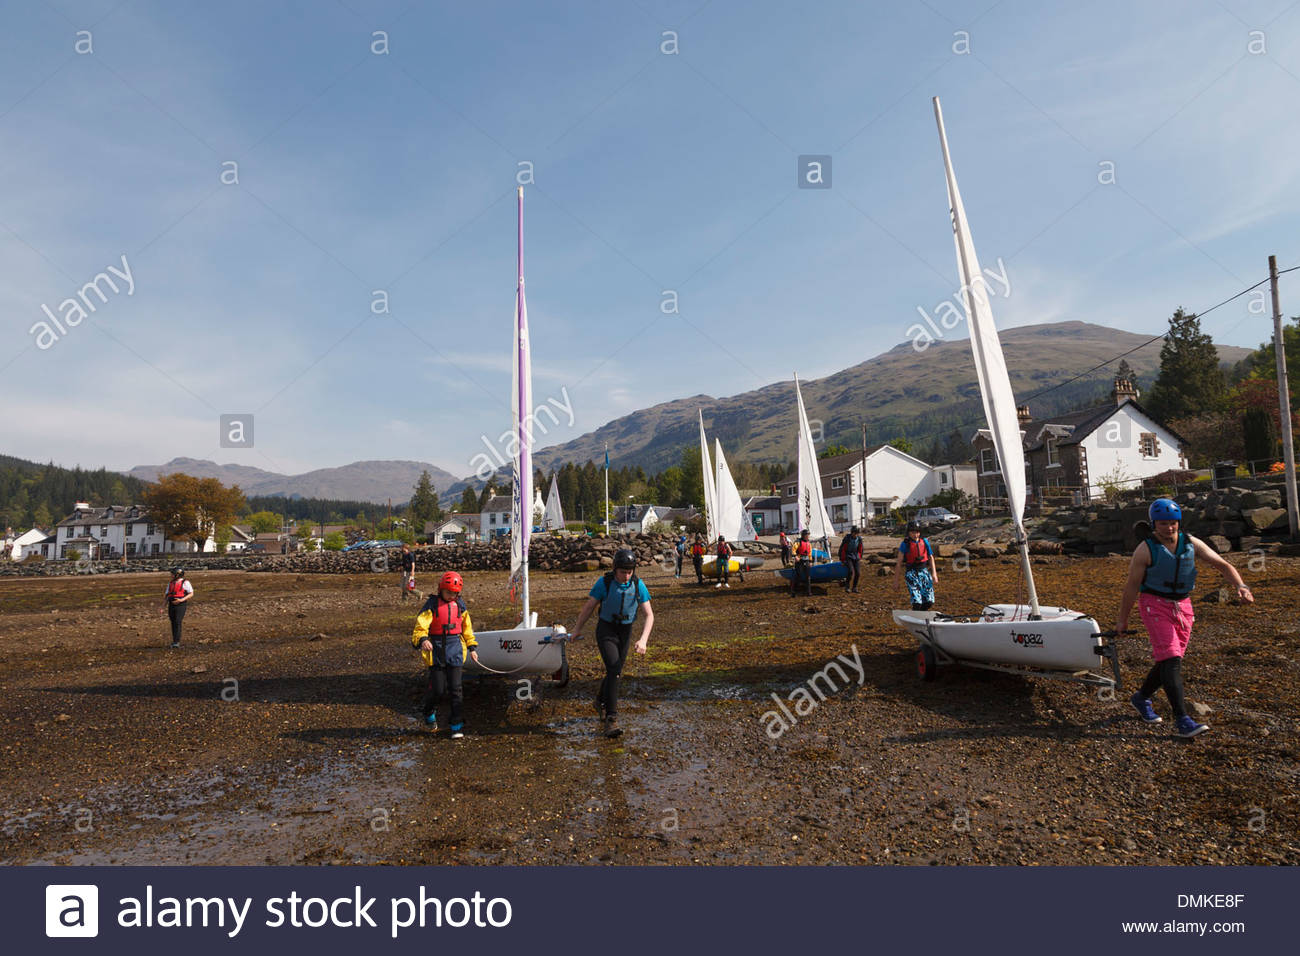 Group of children preparing to go sailing at Lochgoilhead Stock Photo